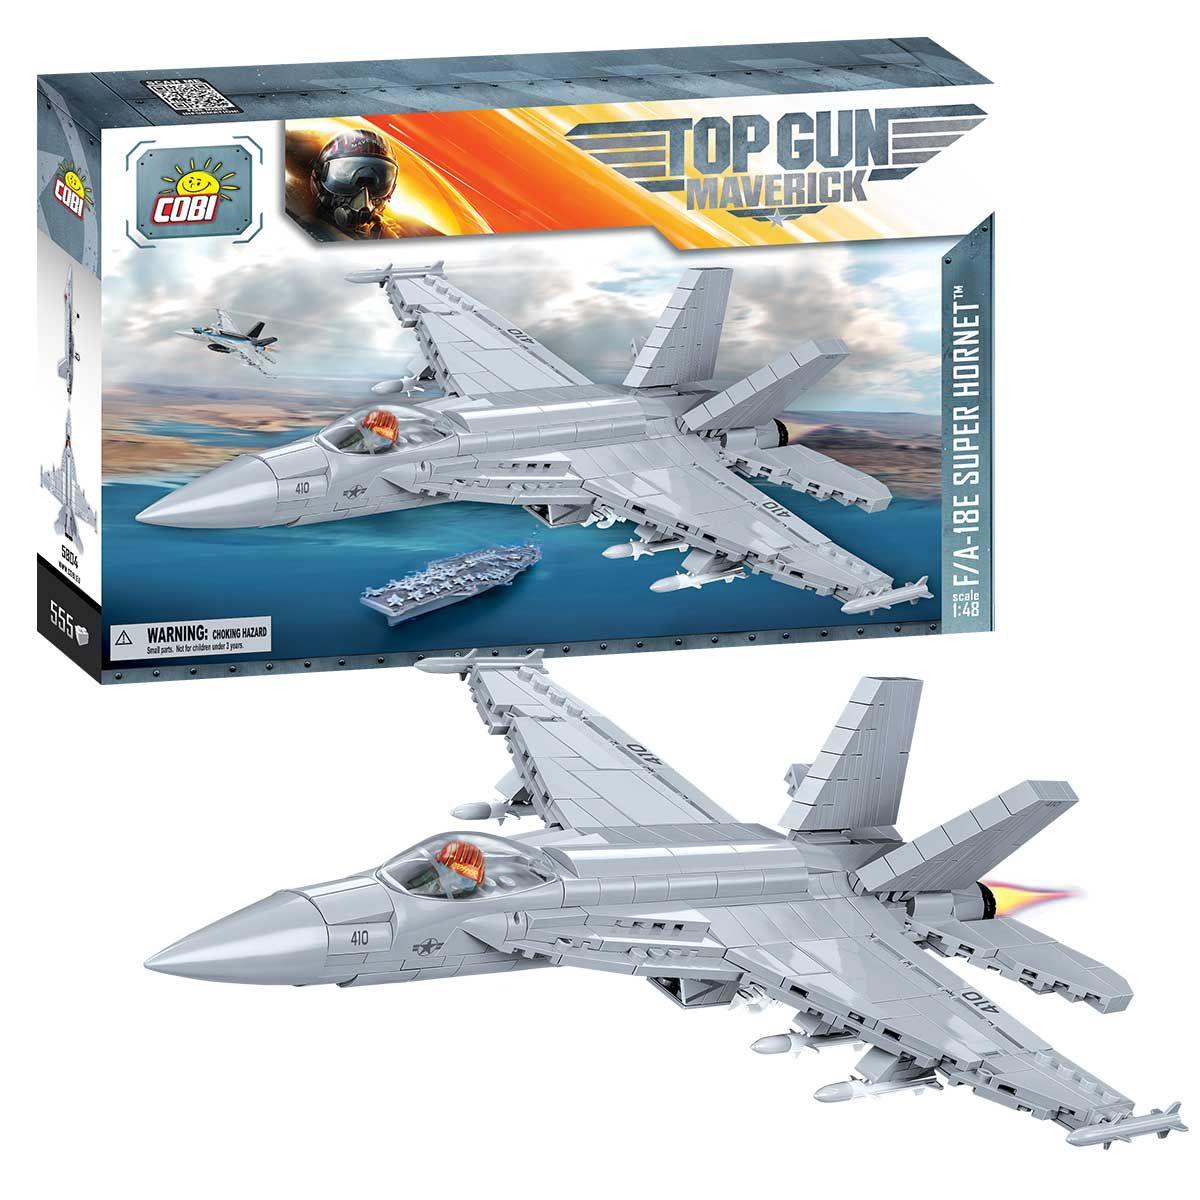 Top Gun Maverick F/A-18E Super Hornet - 565 deler